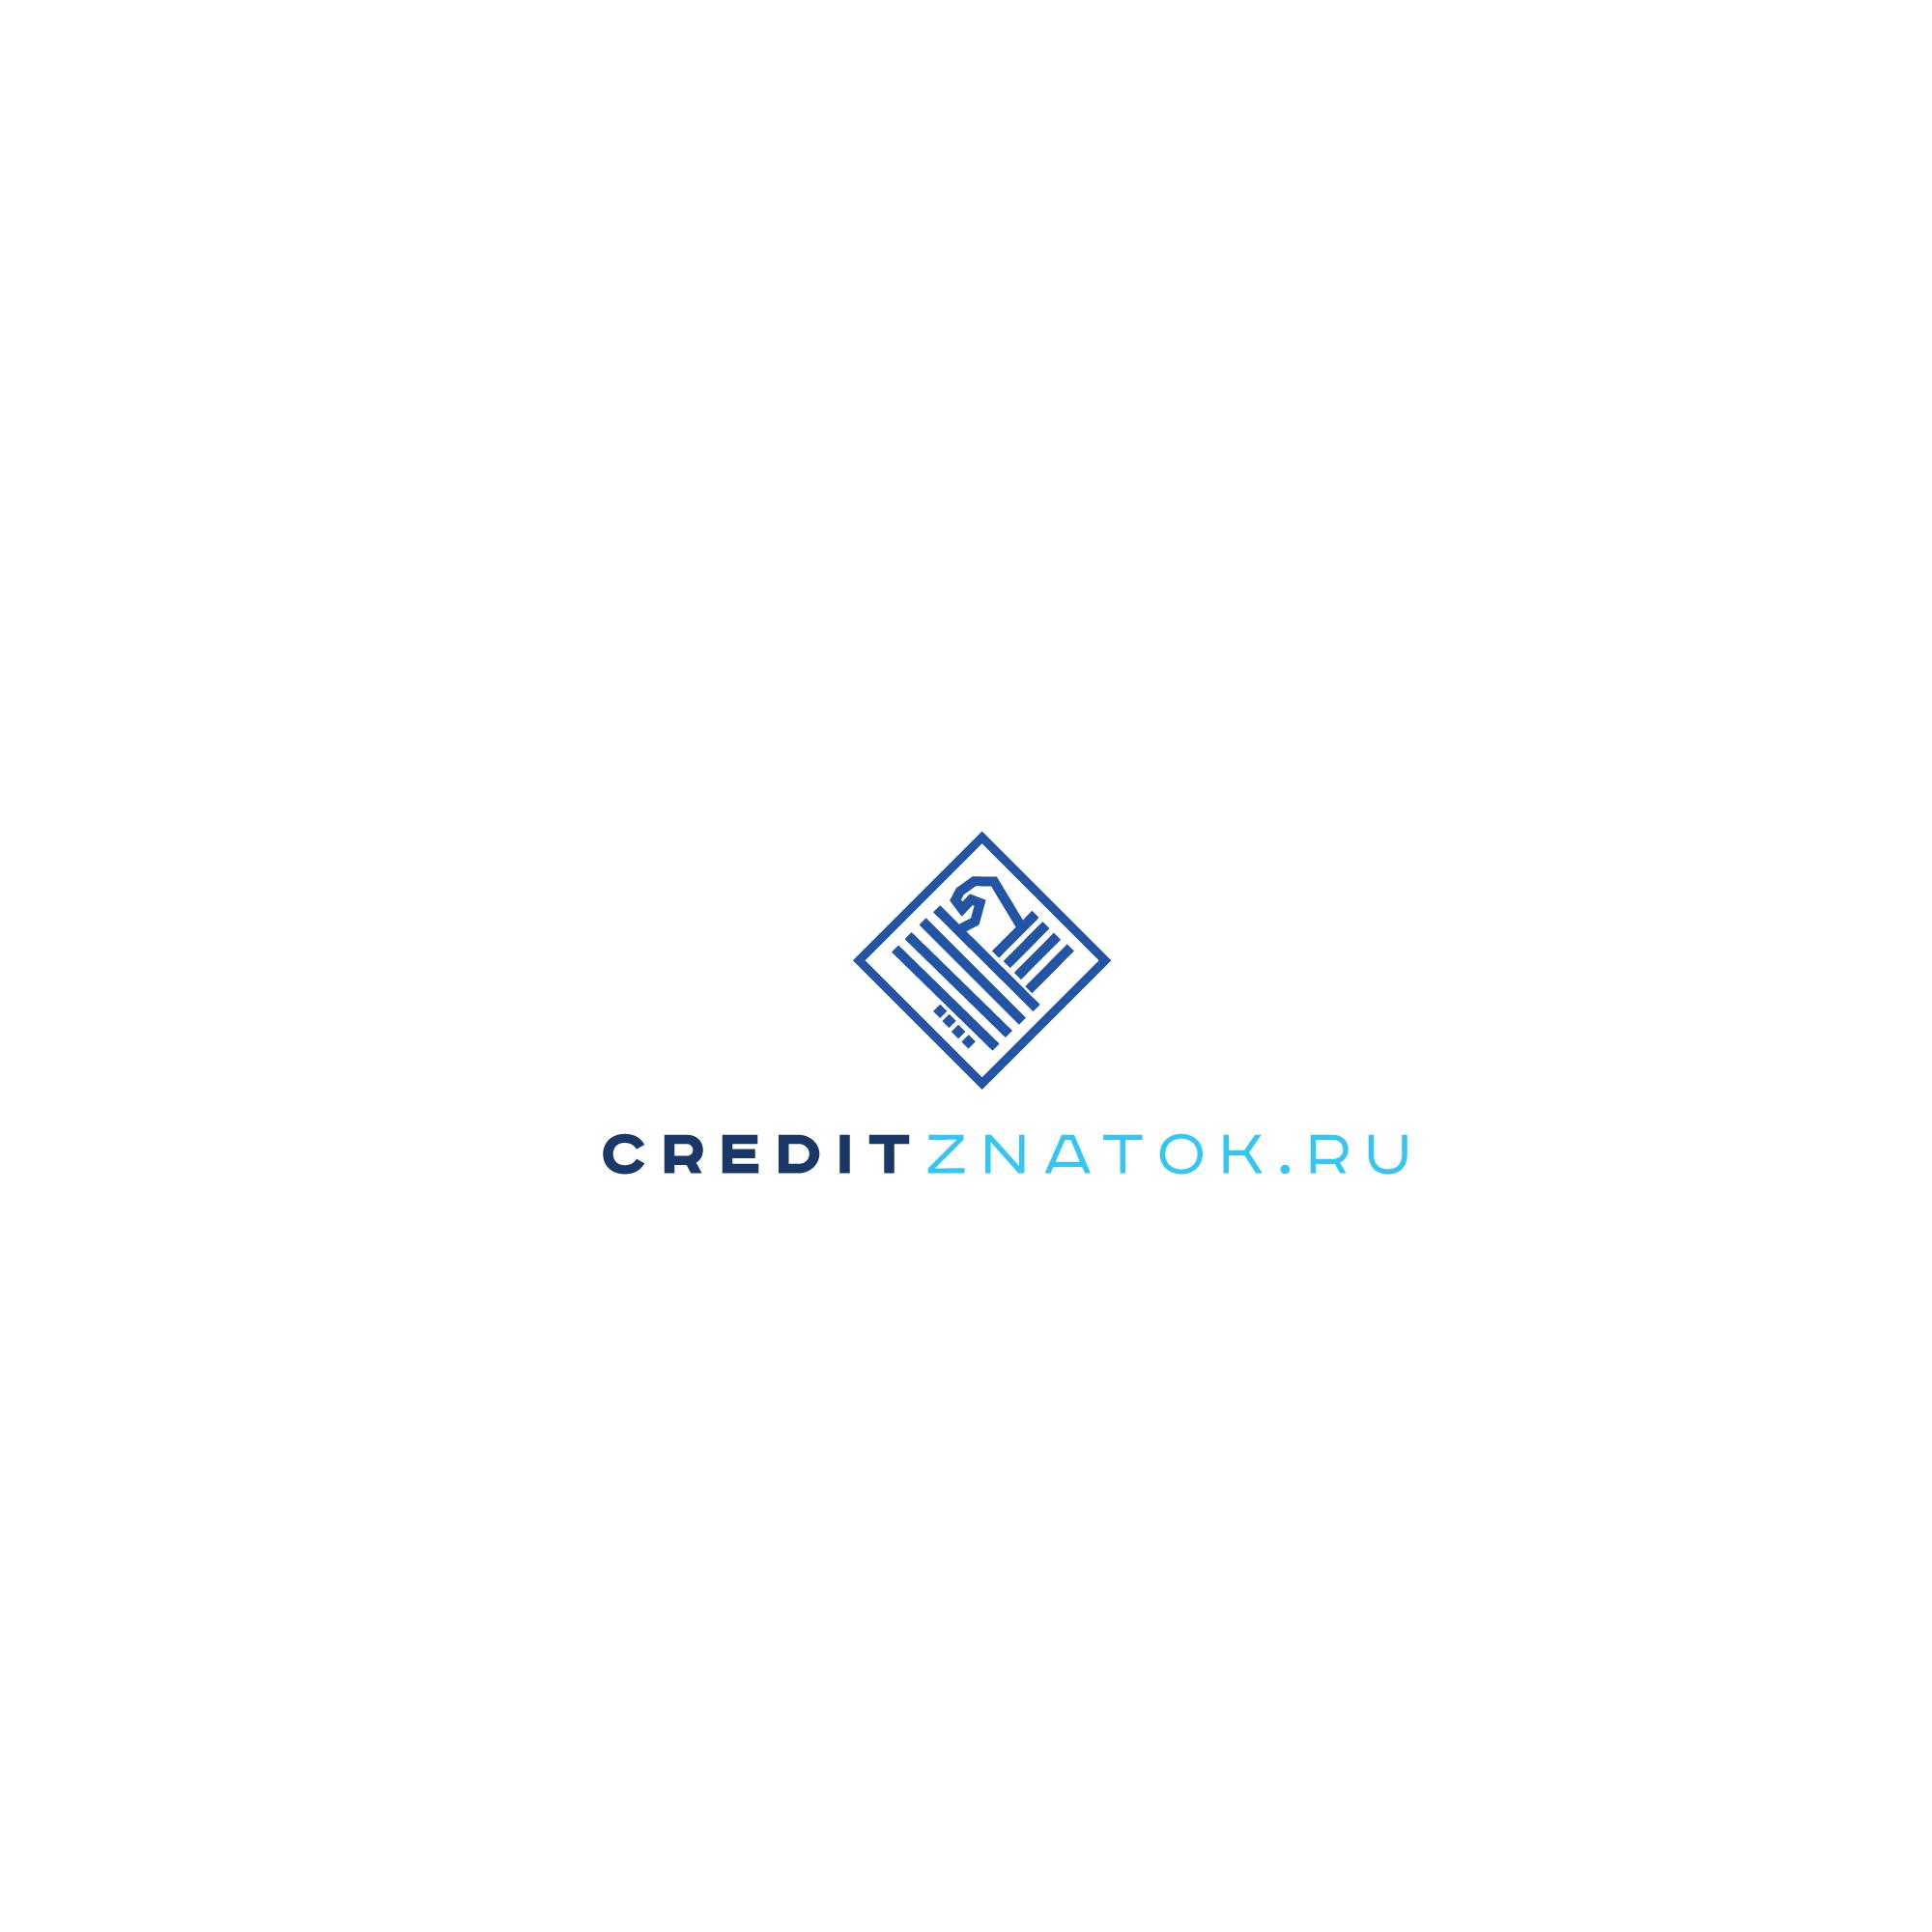 creditznatok.ru - логотип фото f_014589878f6c6aa0.jpg